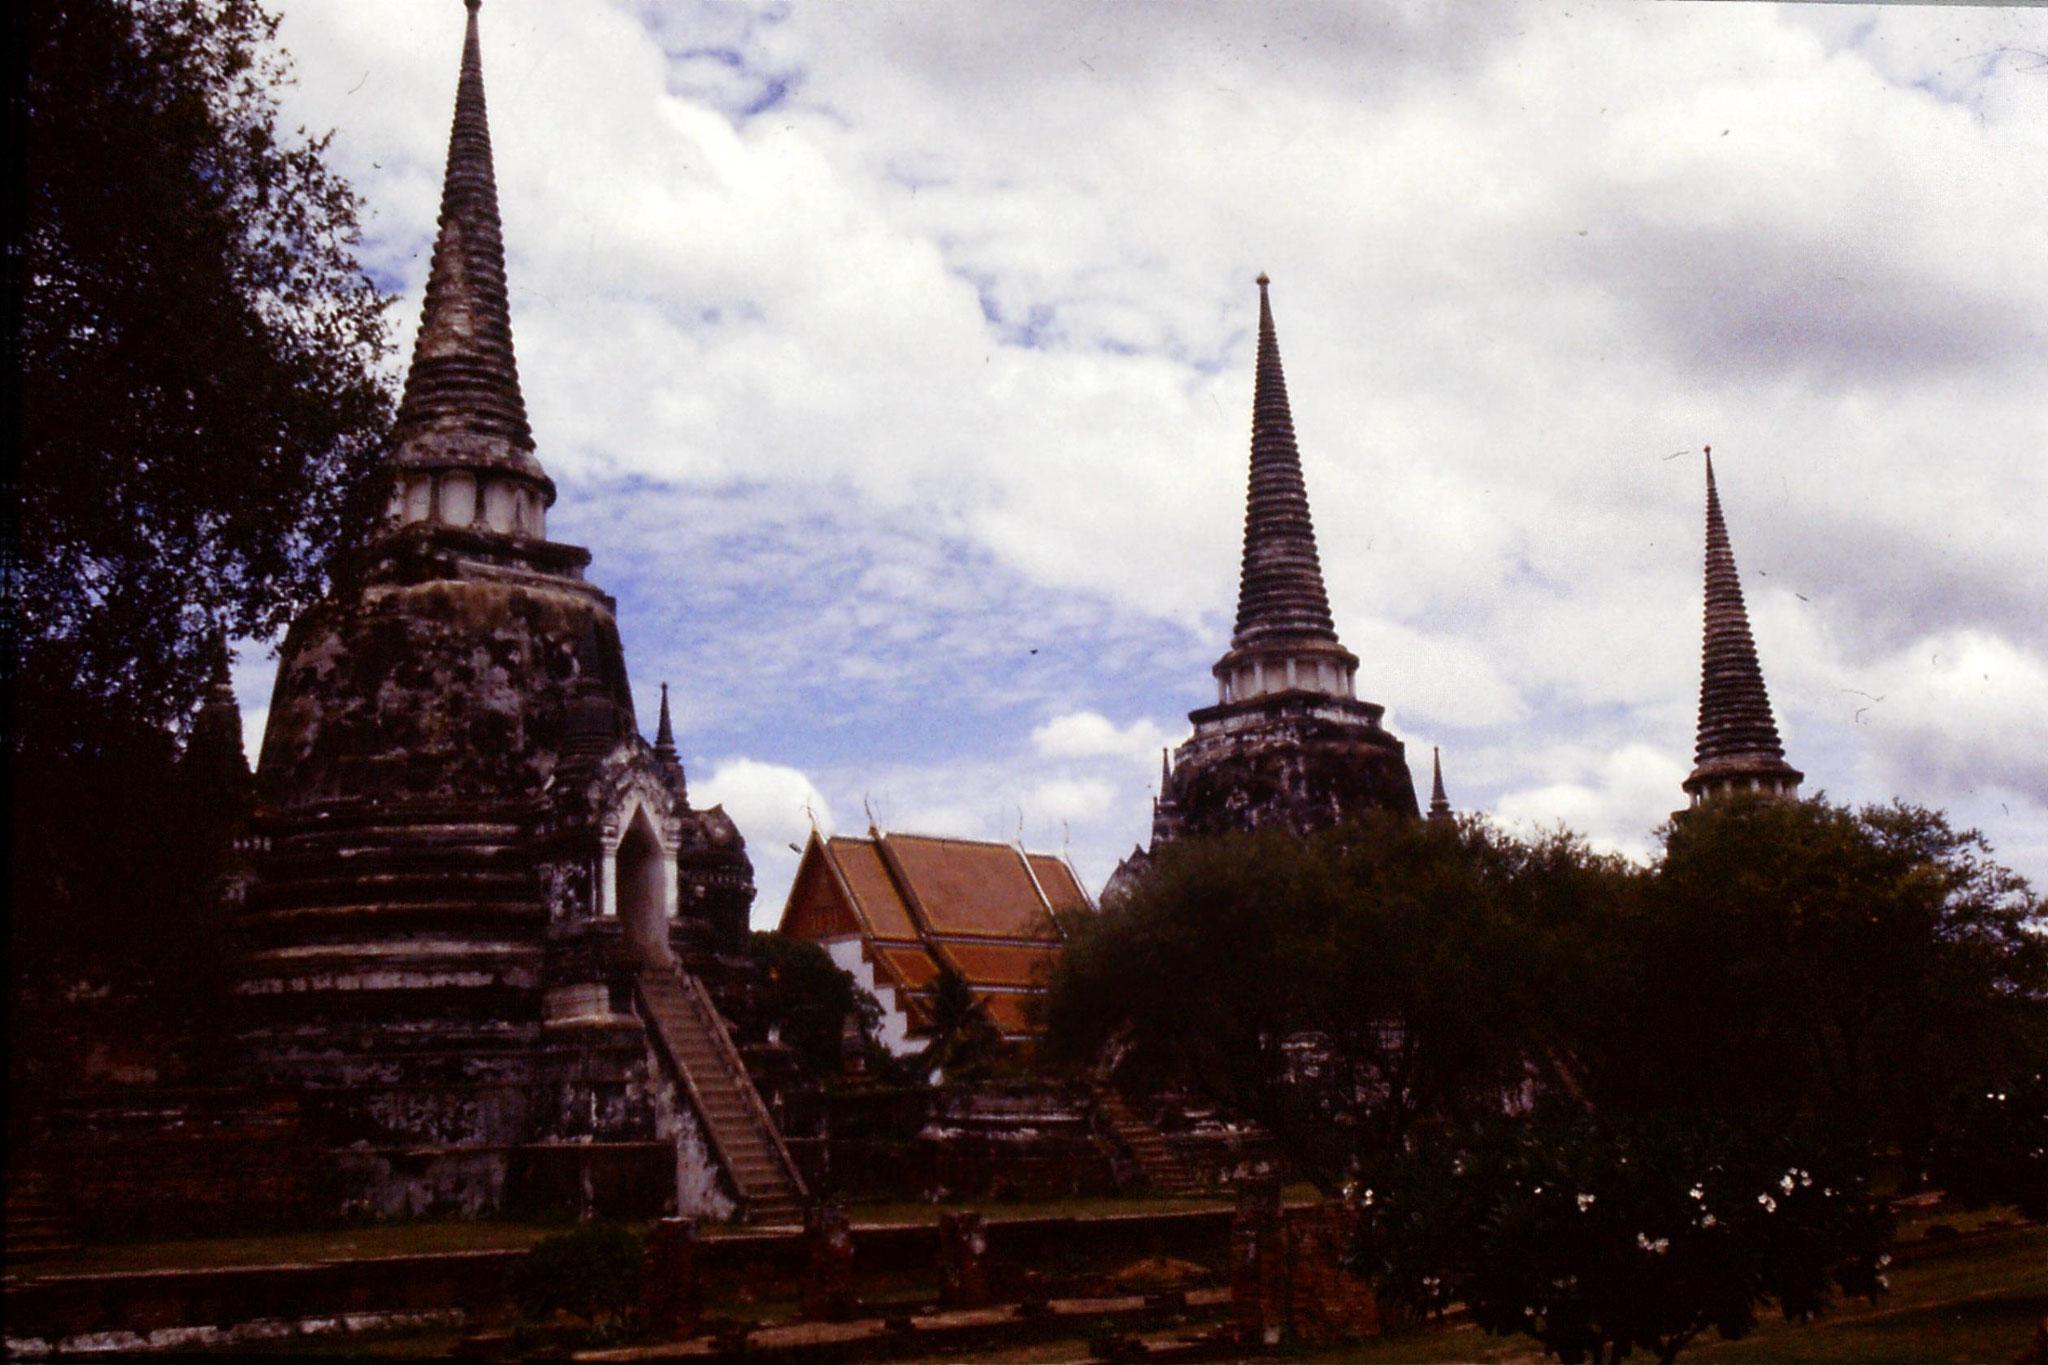 15/6/1990: 7: Ayuttaya Wat Nihara Phra Mongkol Bopit